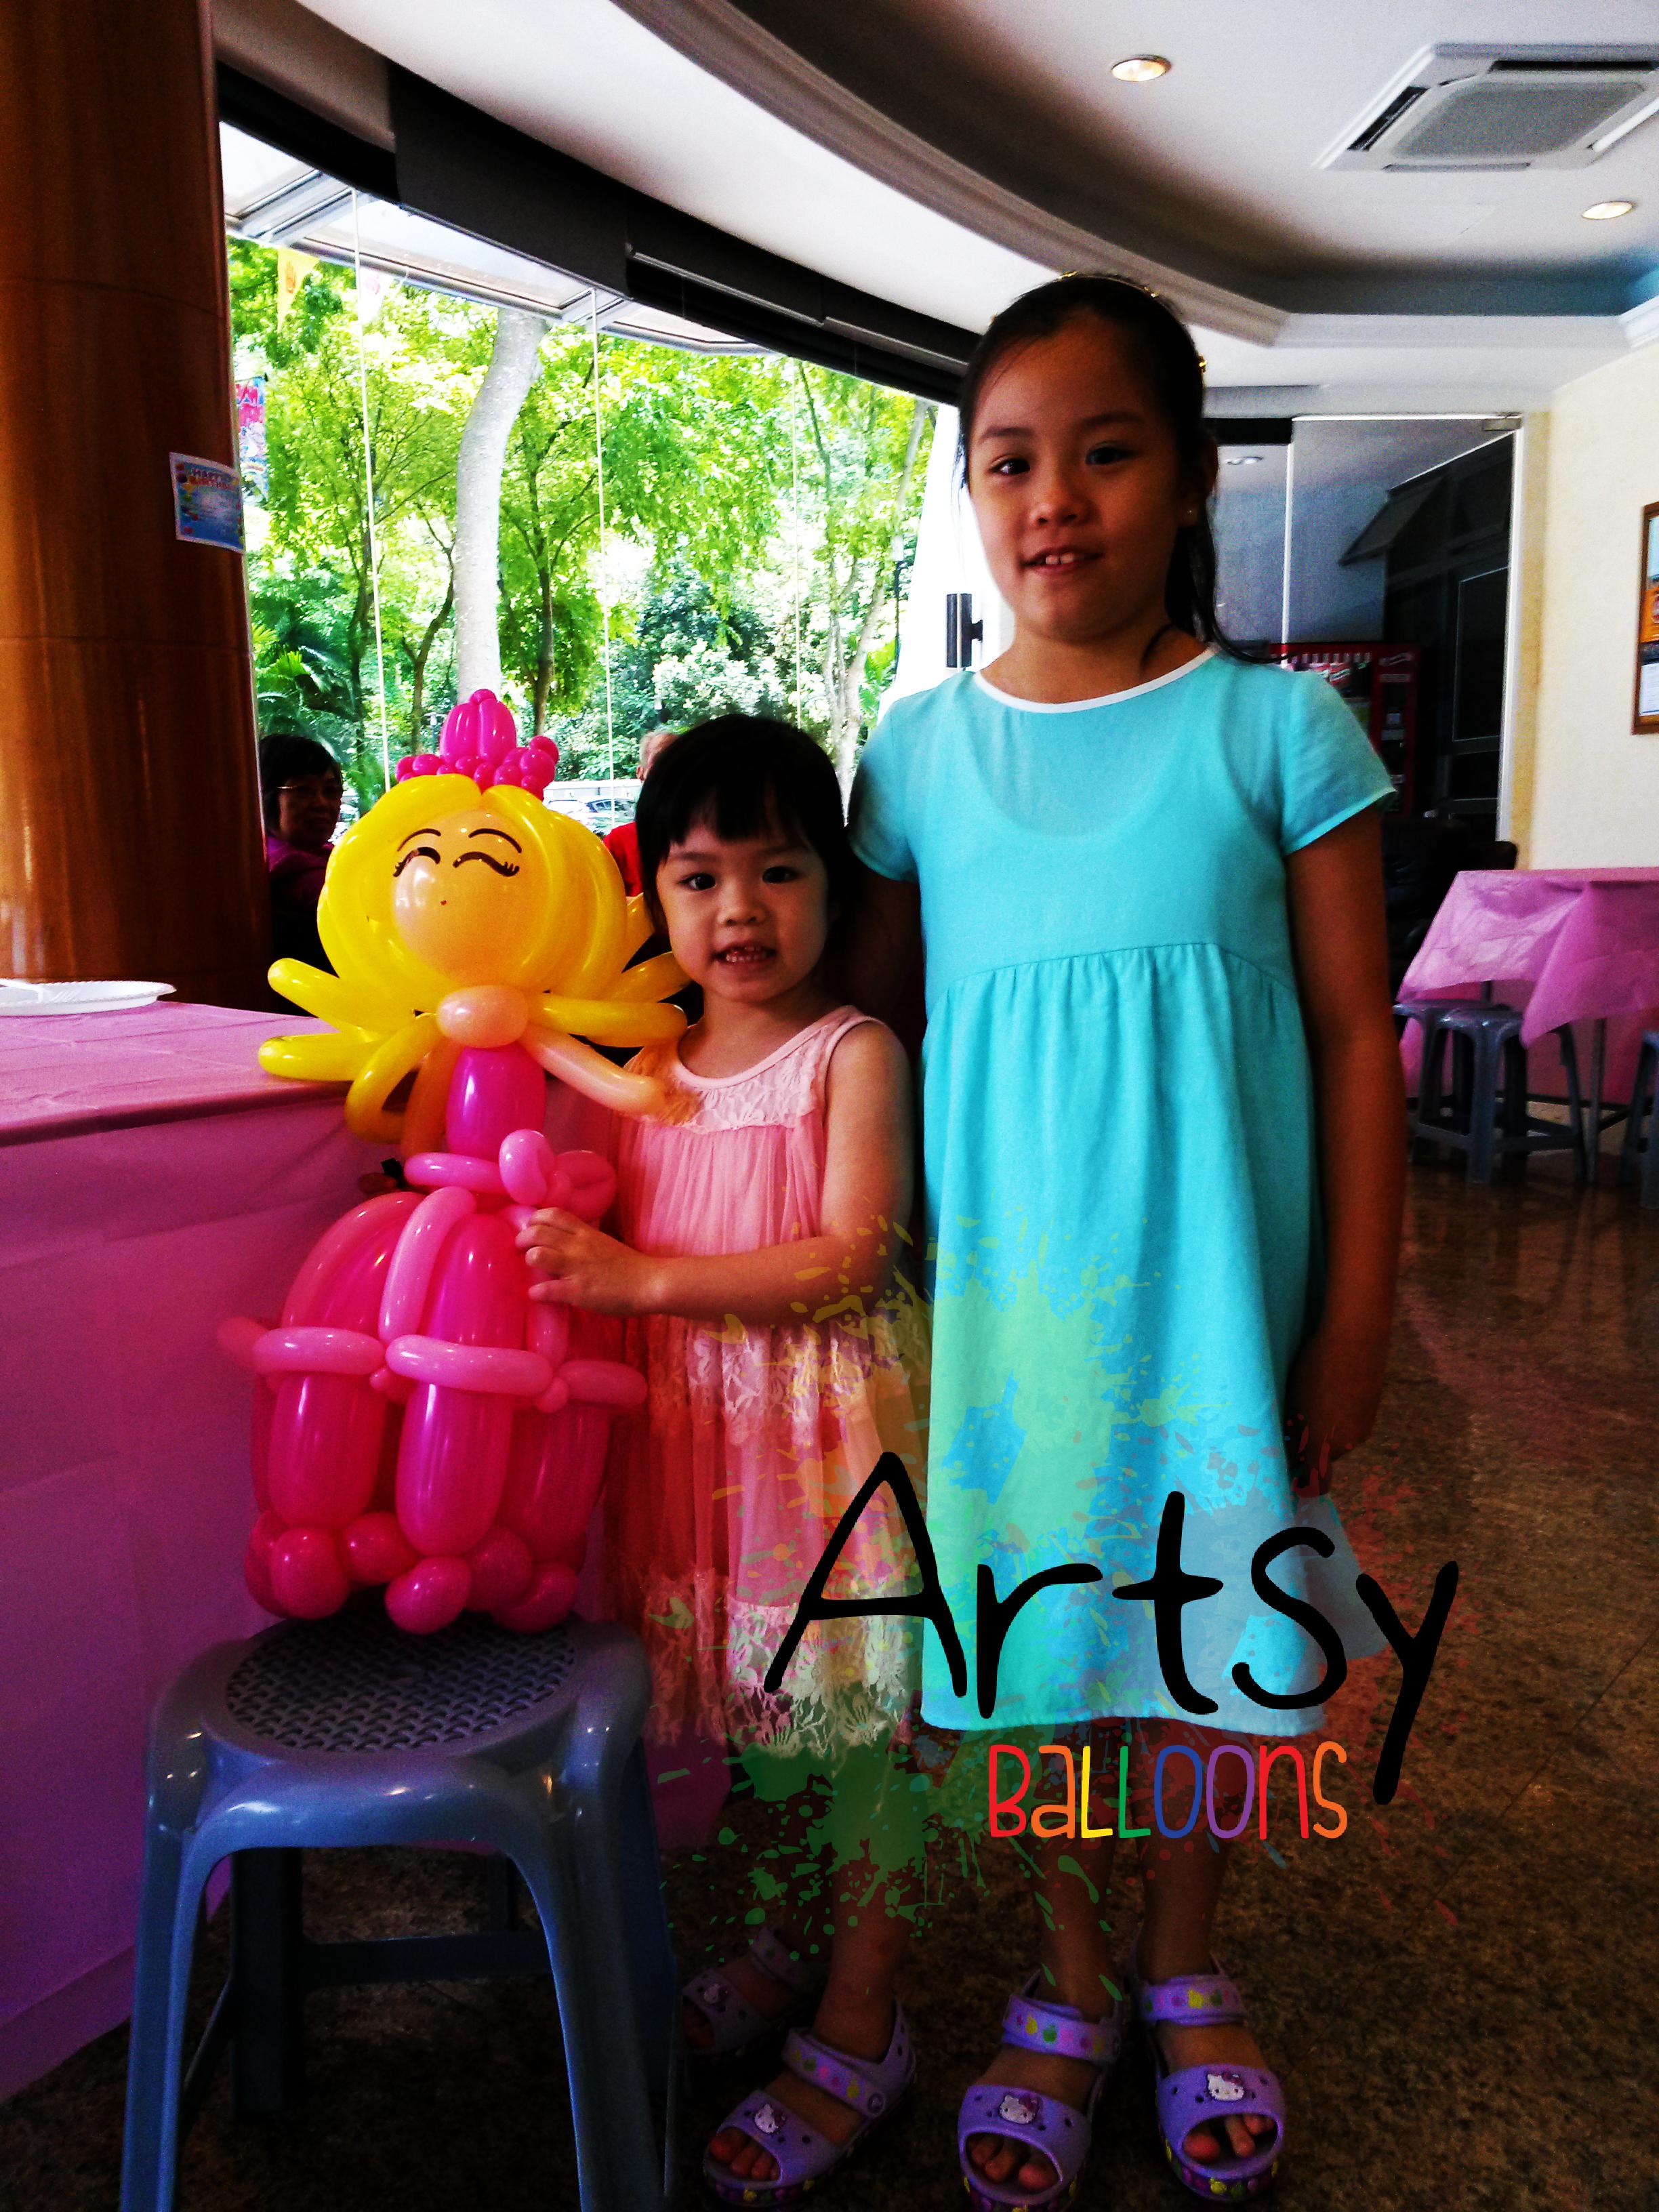 , Balloon Sculptures, Singapore Balloon Decoration Services - Balloon Workshop and Balloon Sculpting